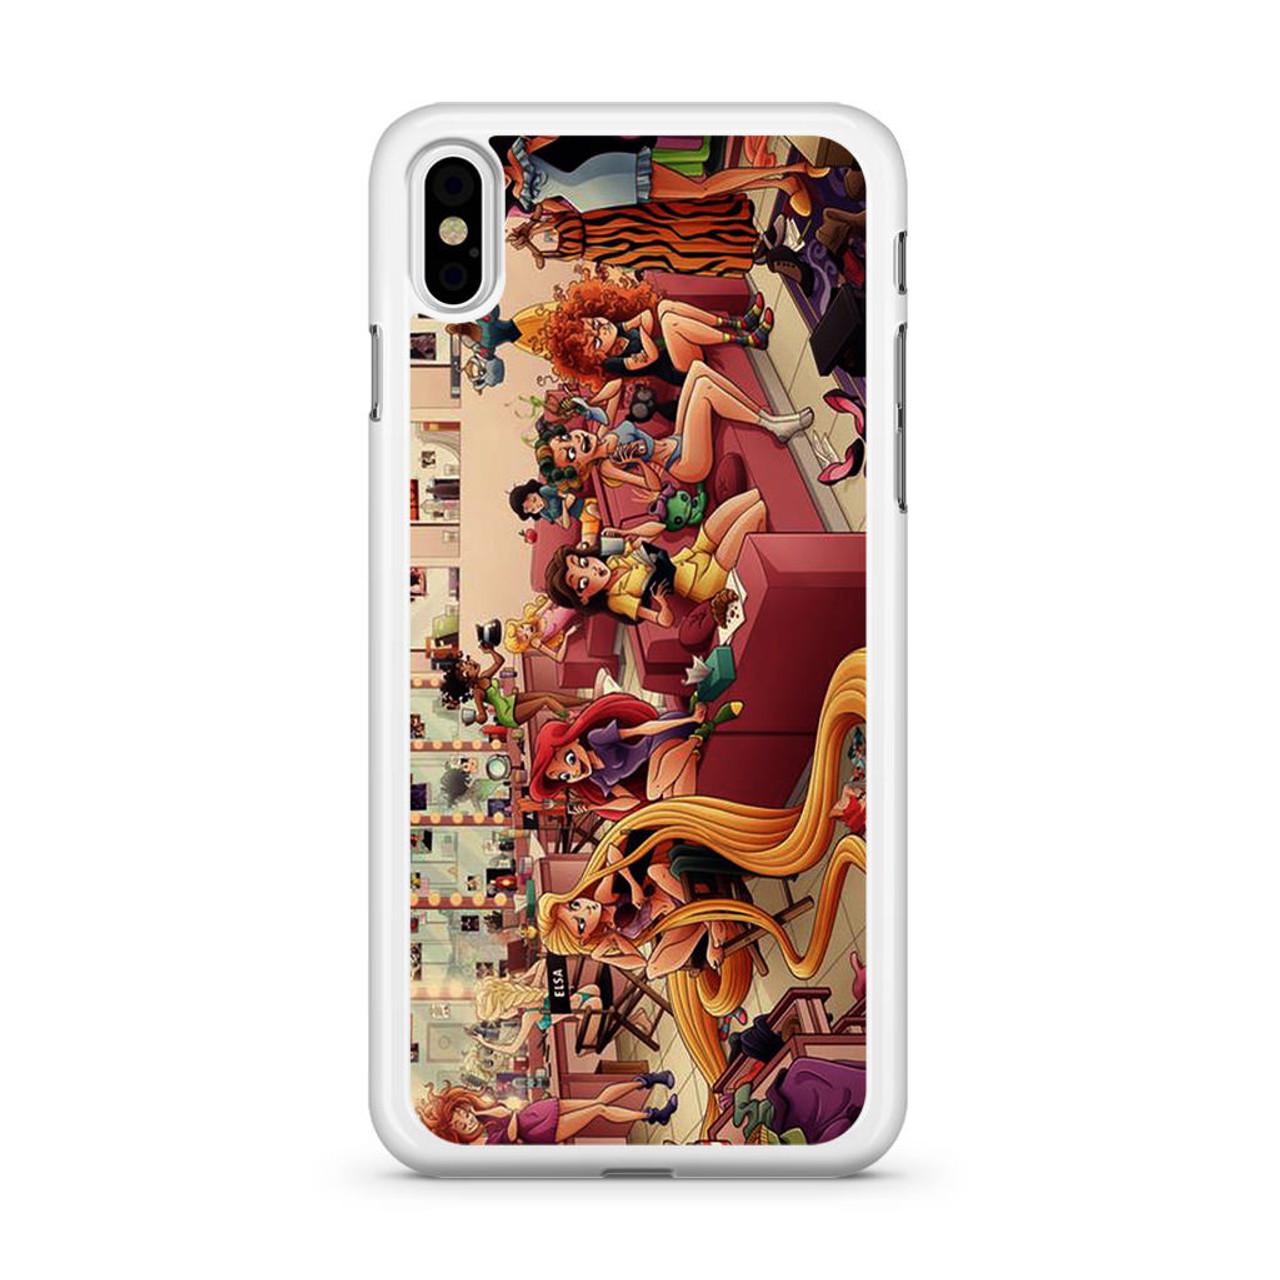 Zombie Belle Princess iphone case